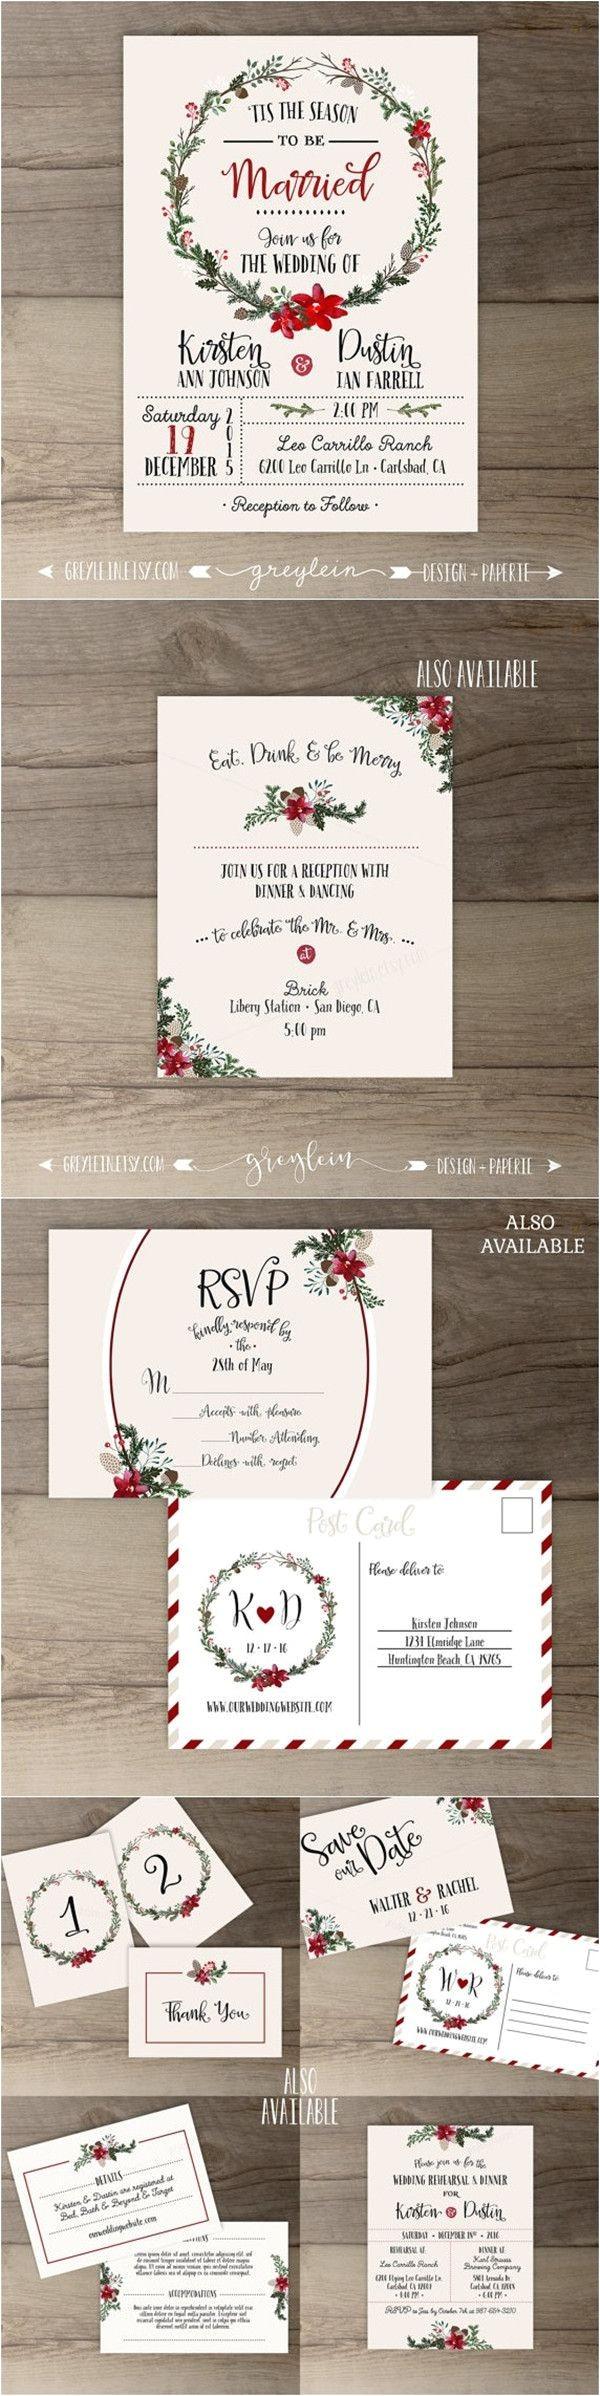 wedding invitation decoupage tray